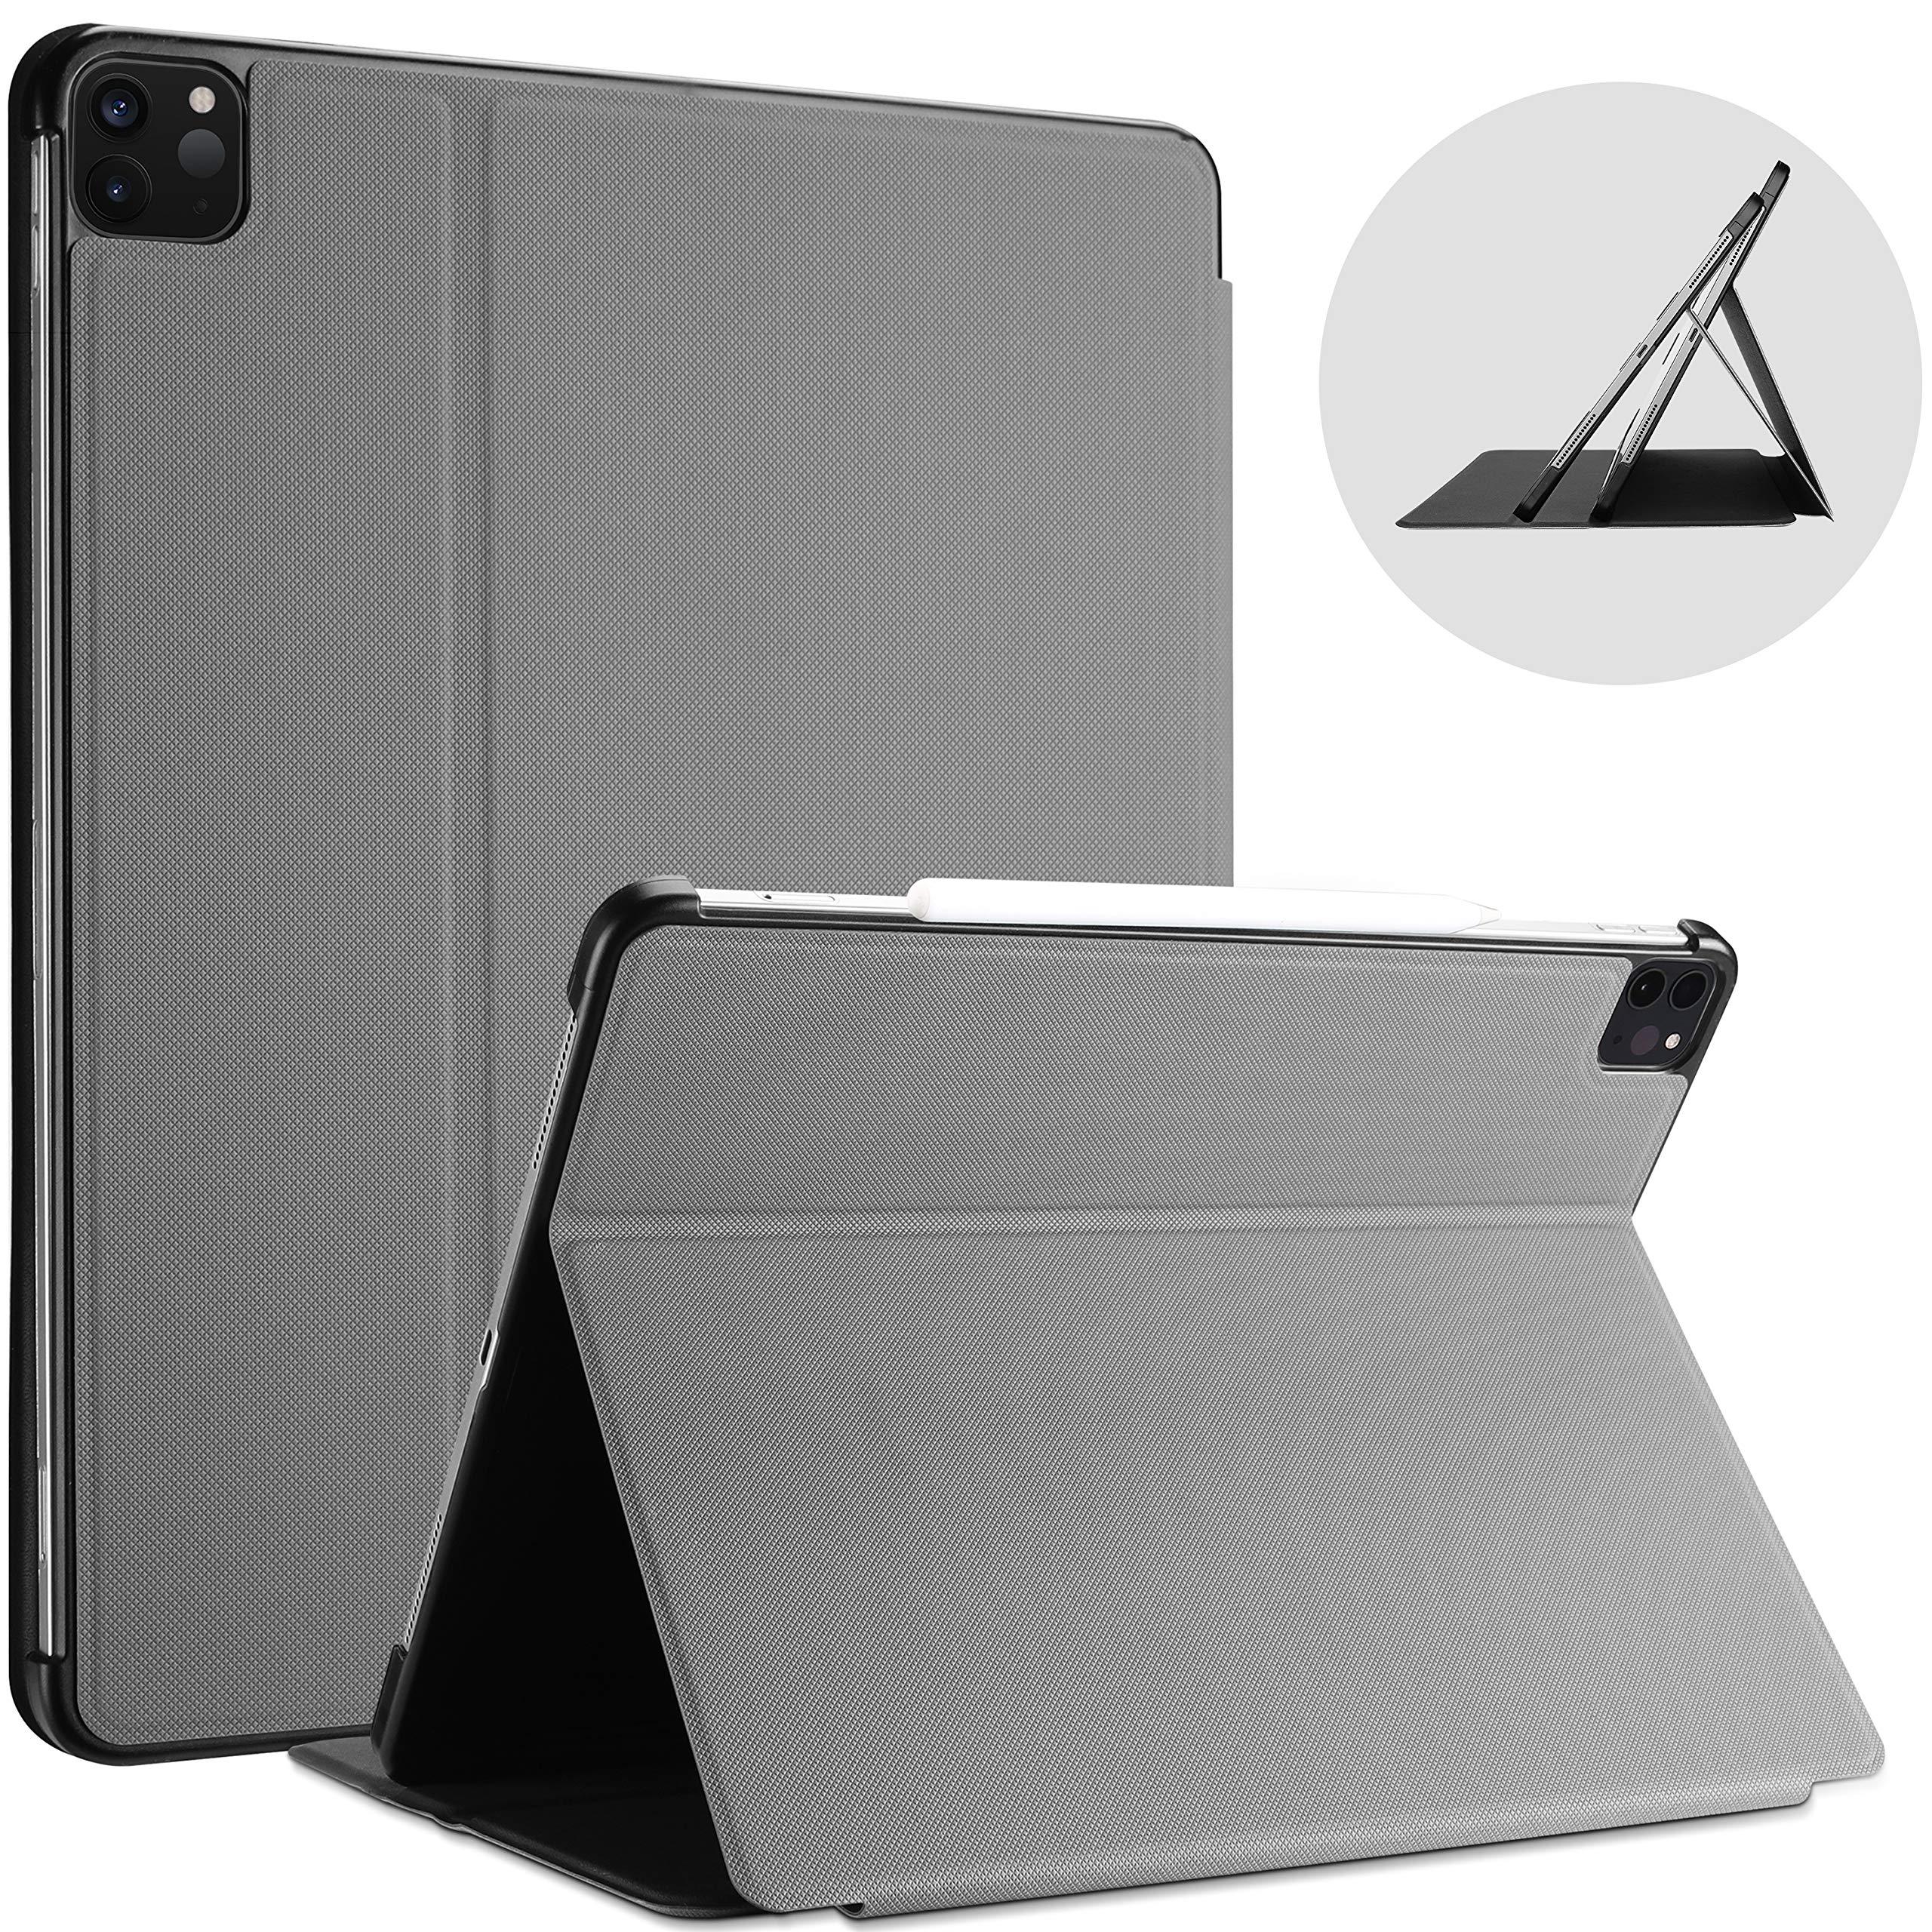 ProCase Funda Antideslizante iPad Pro 11 2.ª generación 2020, Estcuhe Delgado Apoya Cargar Apple Pencil 2, con Tapa Inteligente Carcasa Interna Flexible para iPad Pro 11